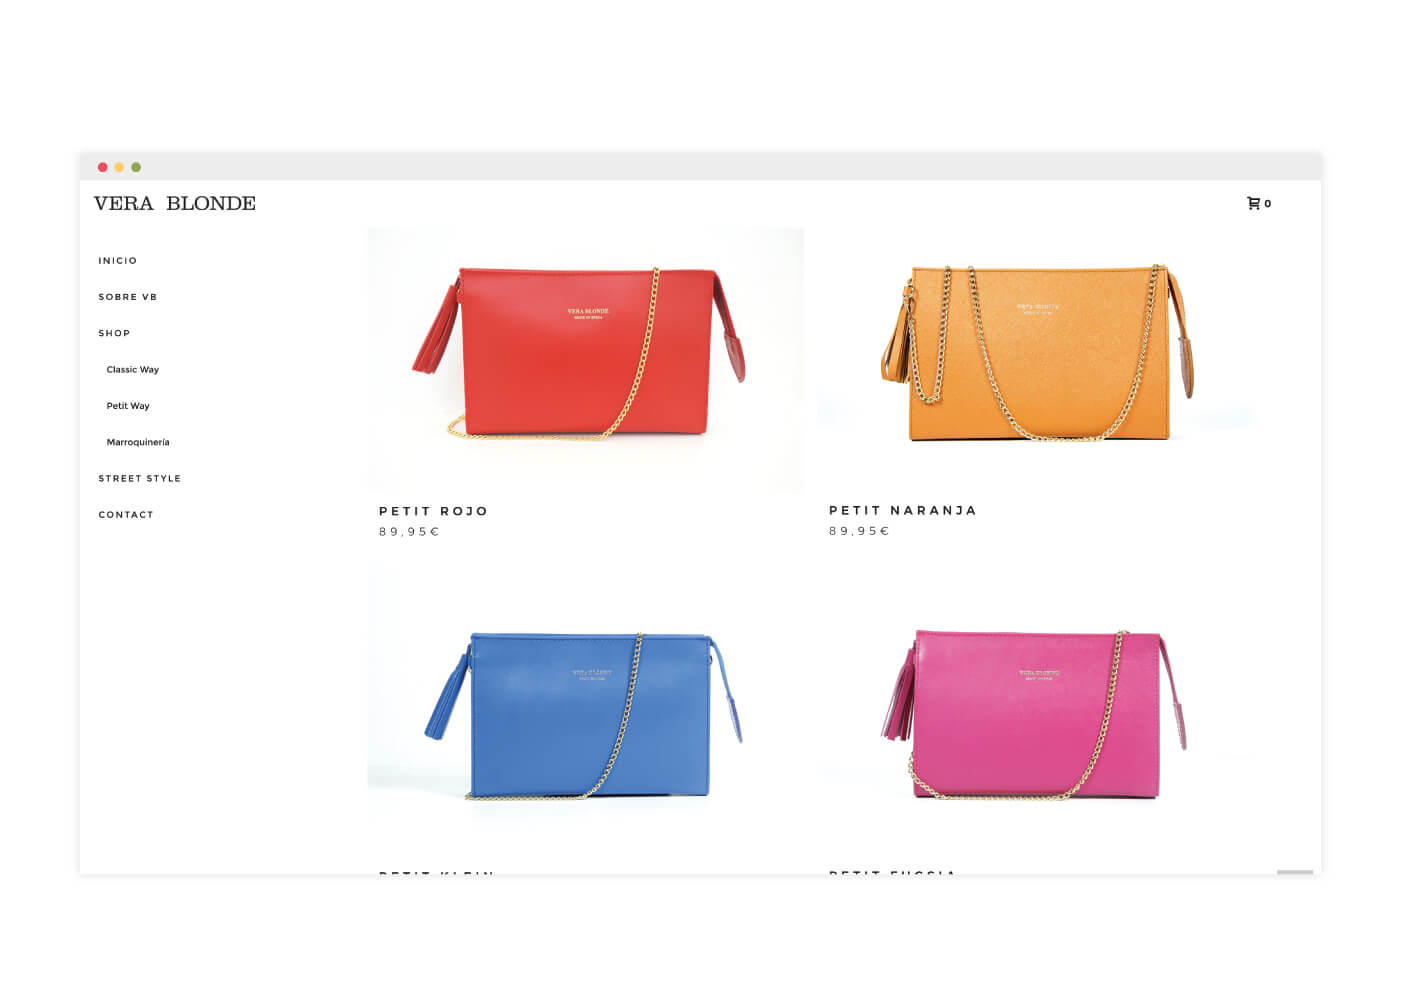 diseno-programacion-tienda-online-bolsos-vera-blonde-7